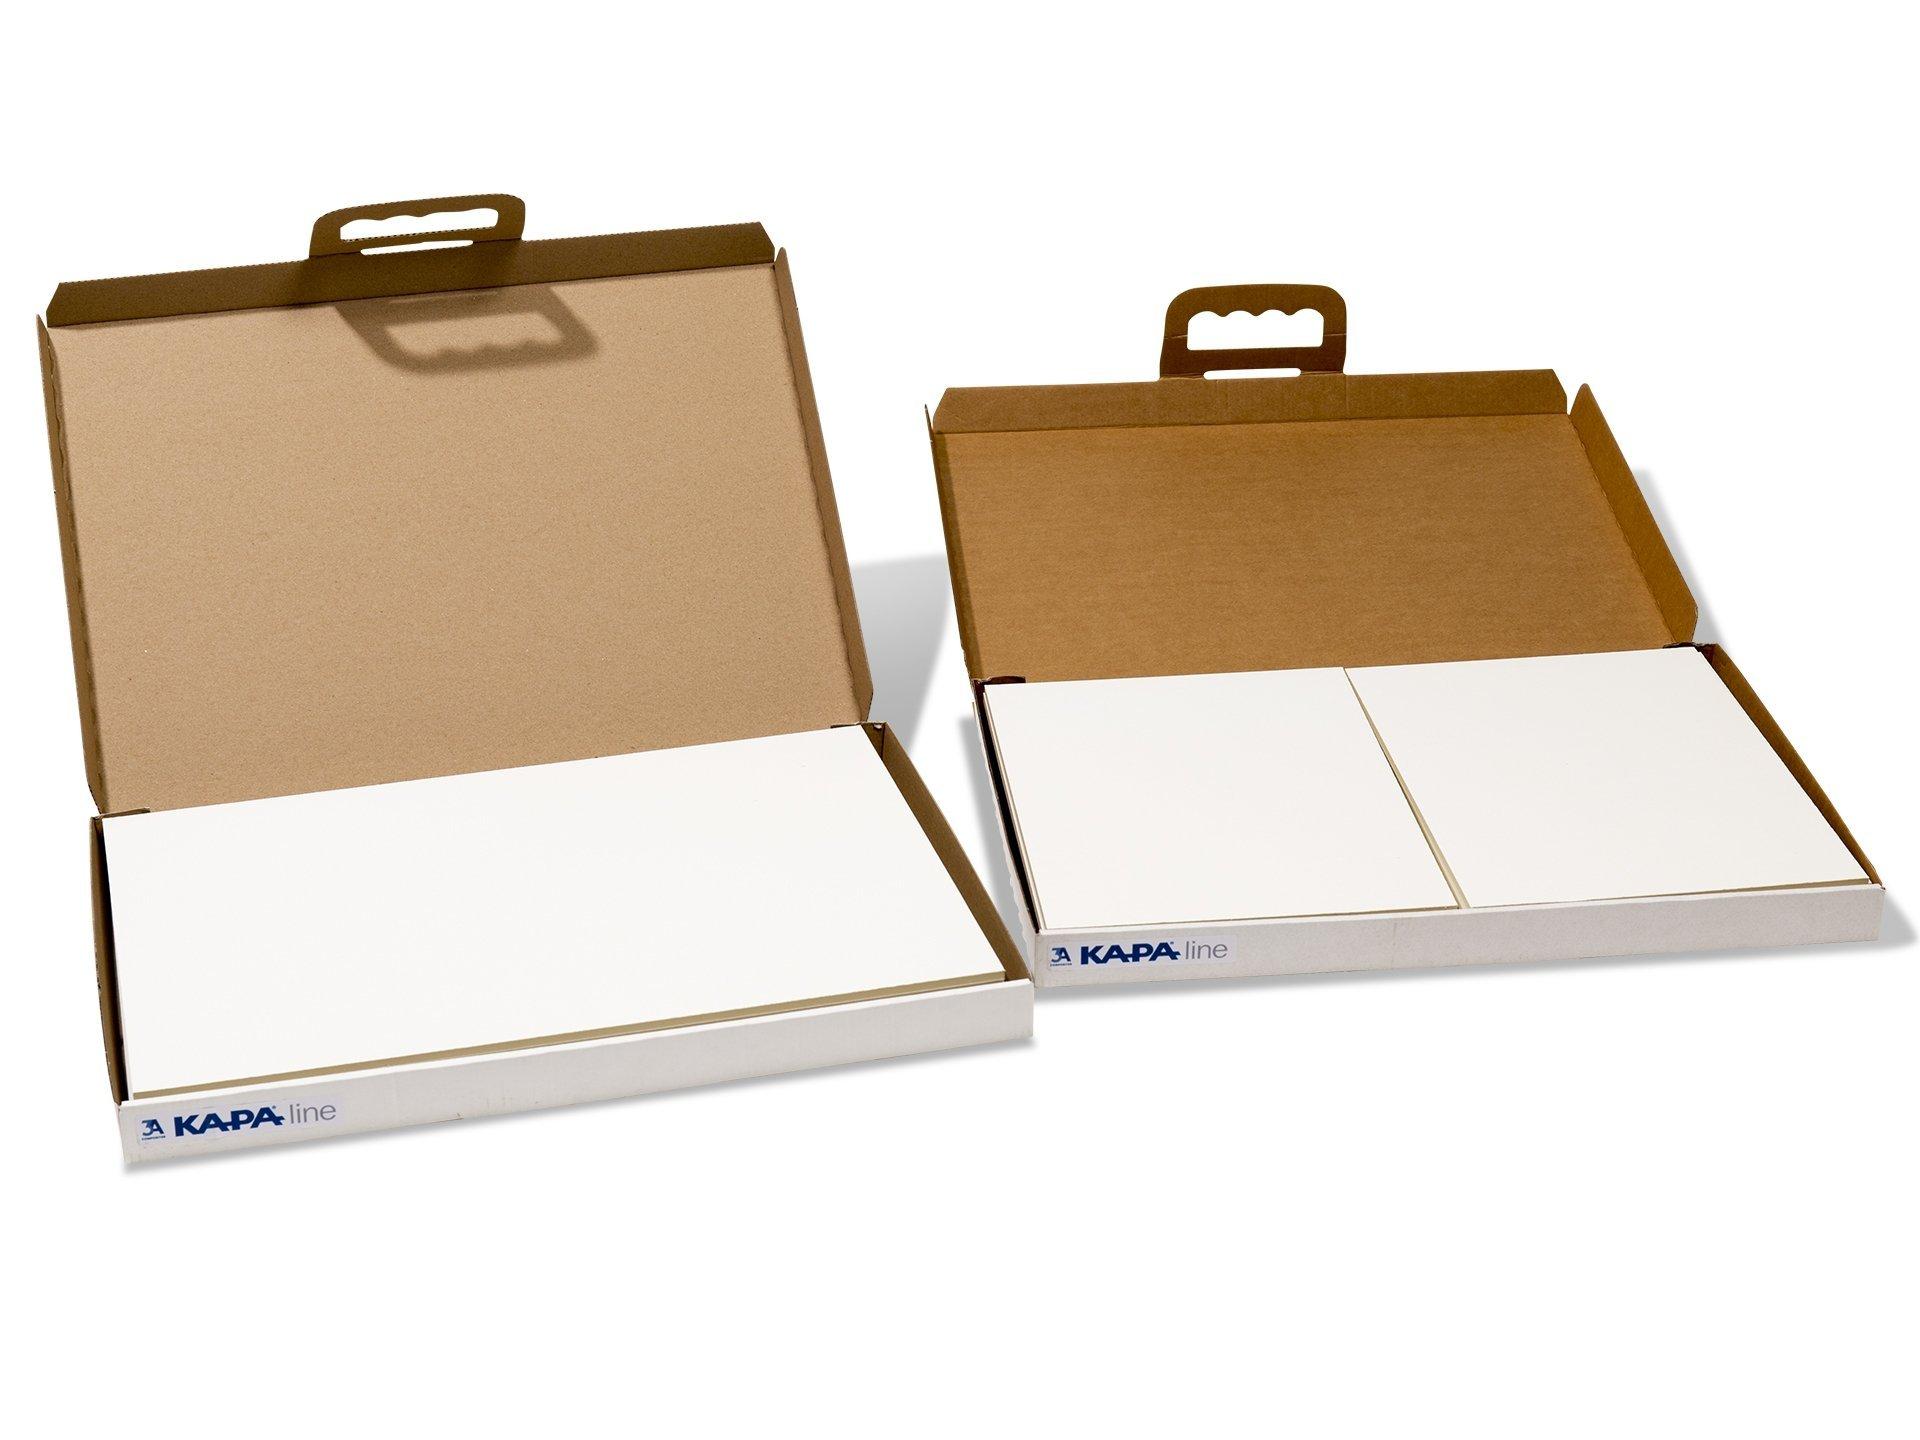 kapa line box jetzt online kaufen modulor. Black Bedroom Furniture Sets. Home Design Ideas